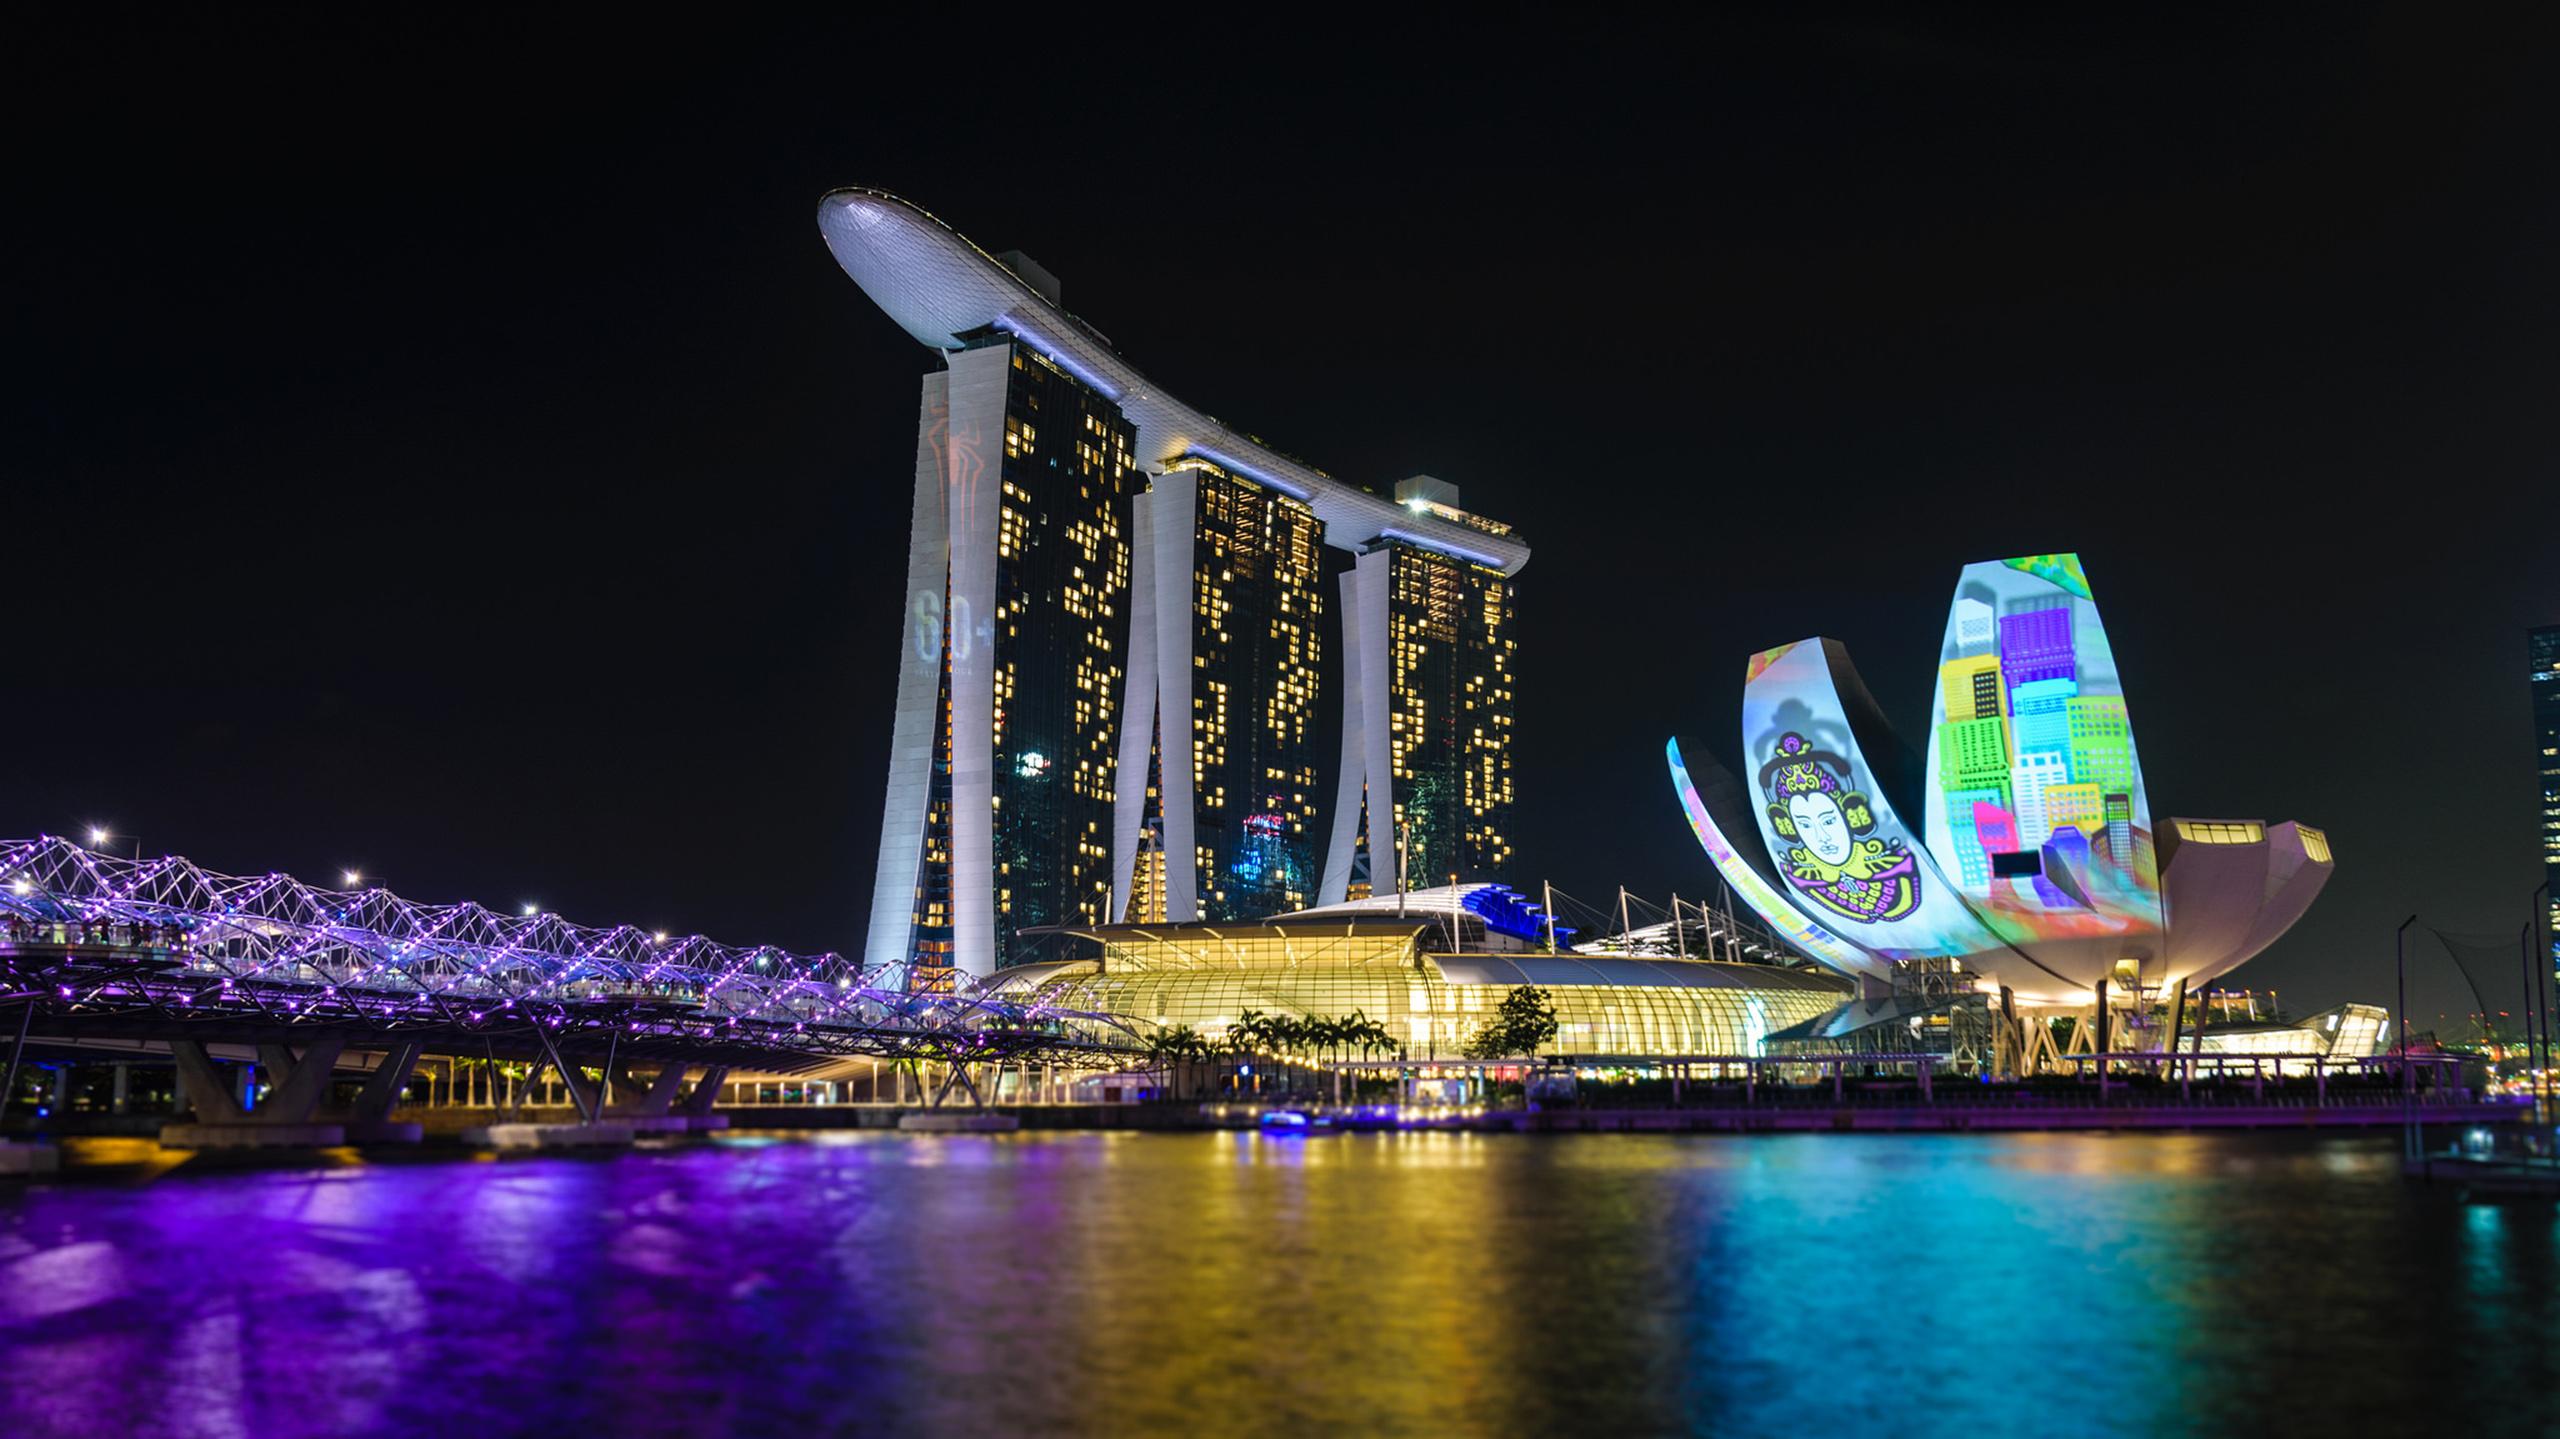 Helix Bridge Singapore Wallpapers Pictures Images